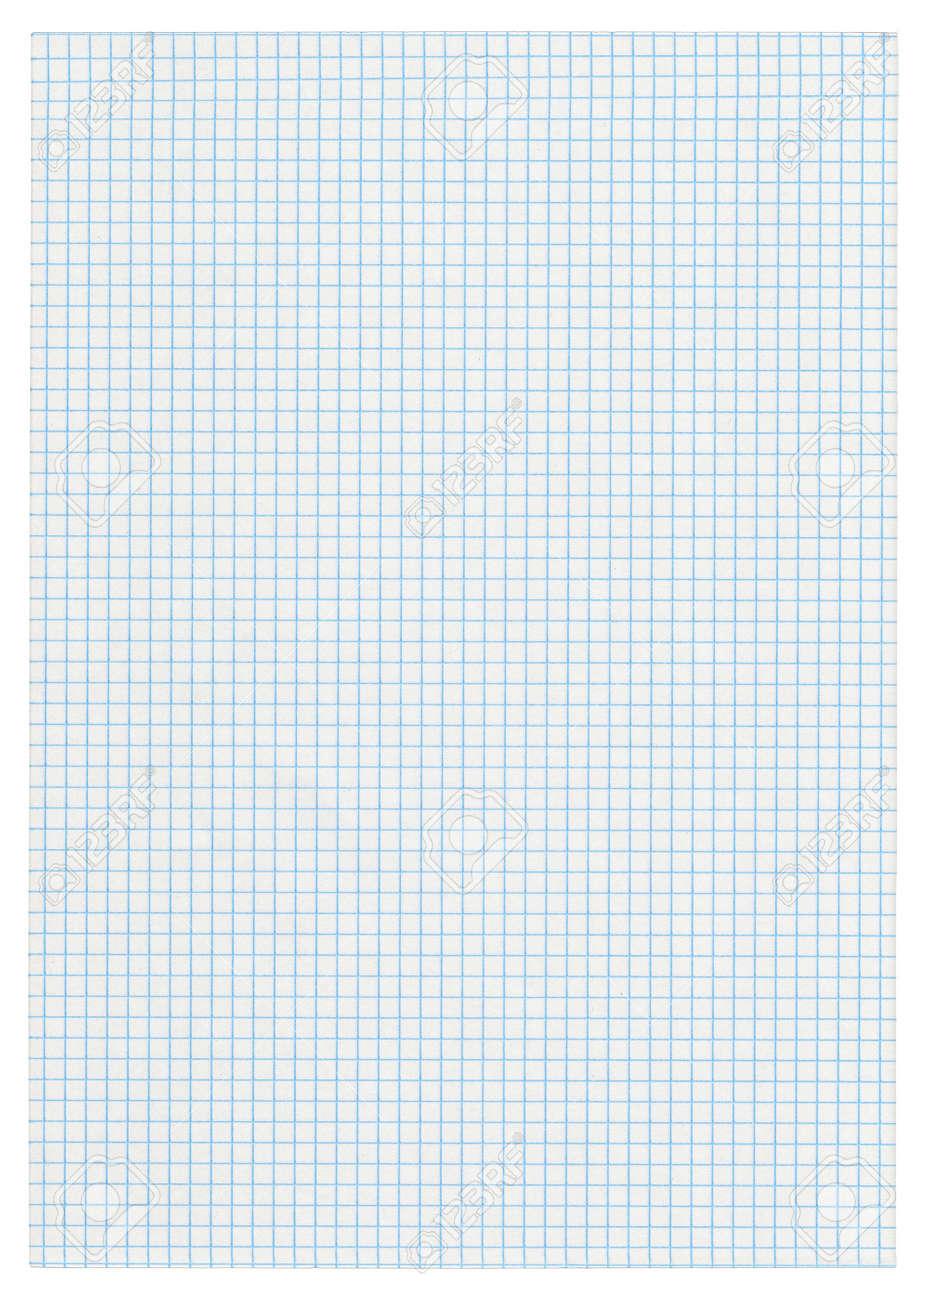 XXXL size piece of squared paper on white background Stock Photo - 5913802